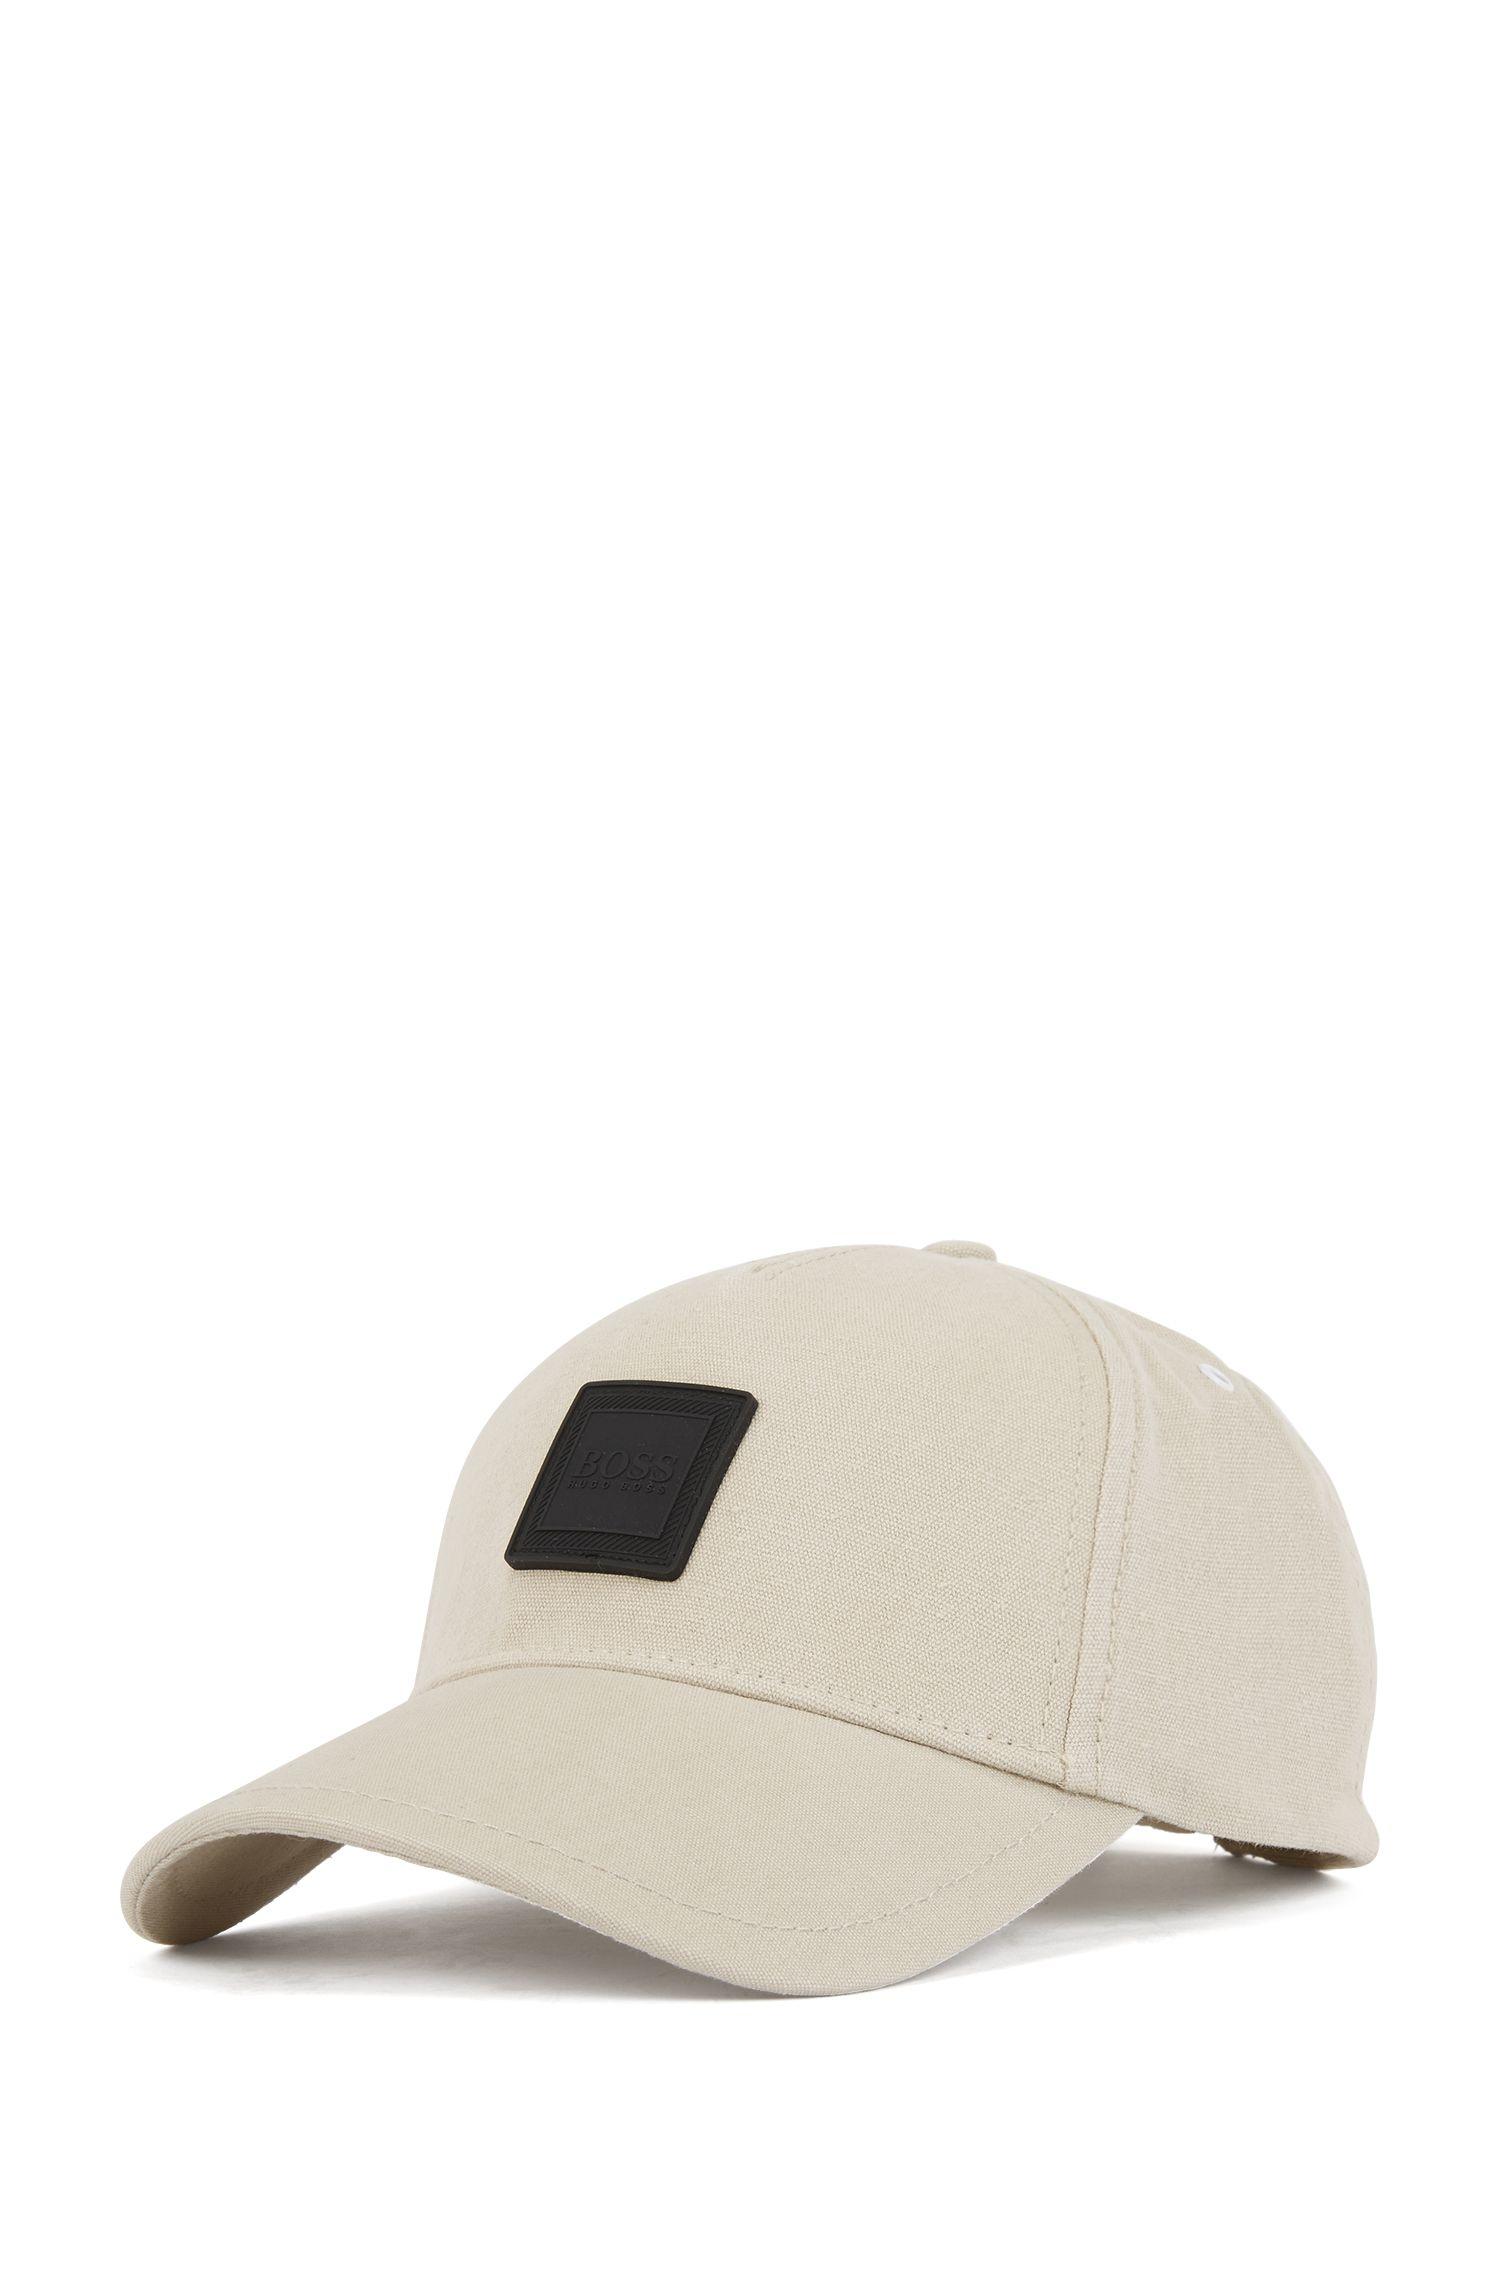 Stückgefärbte Cap aus Baumwolle mit Silikon-Logo, Grau